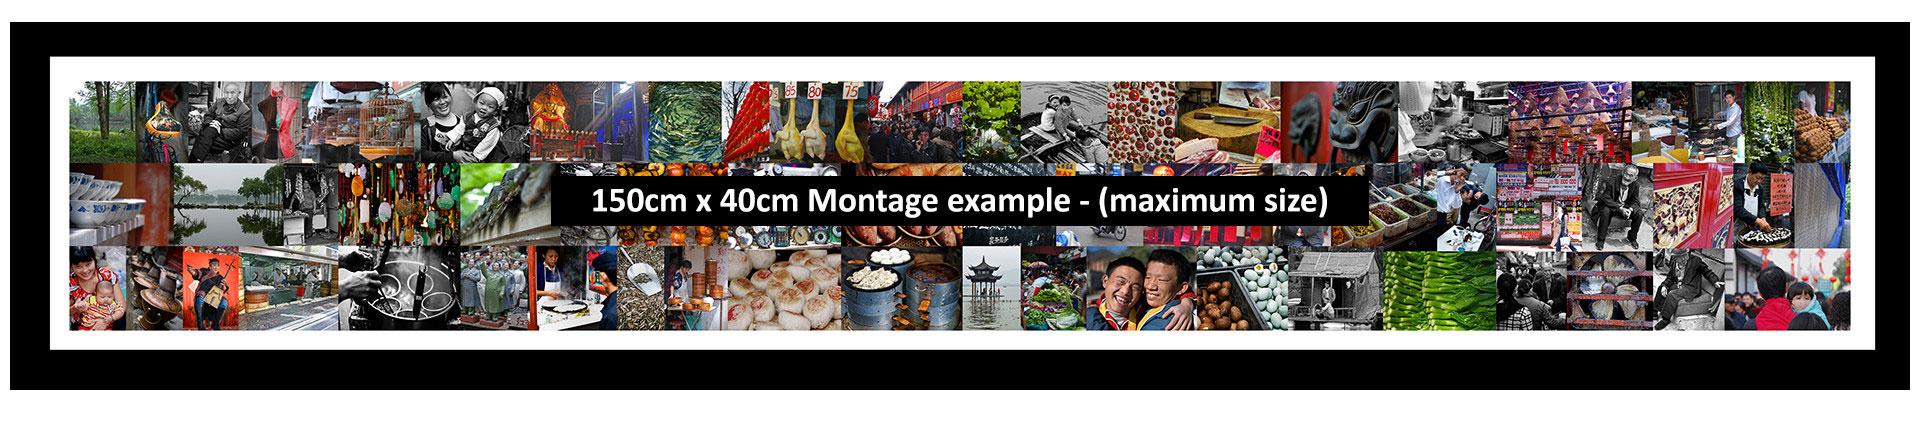 Maxium size Montage